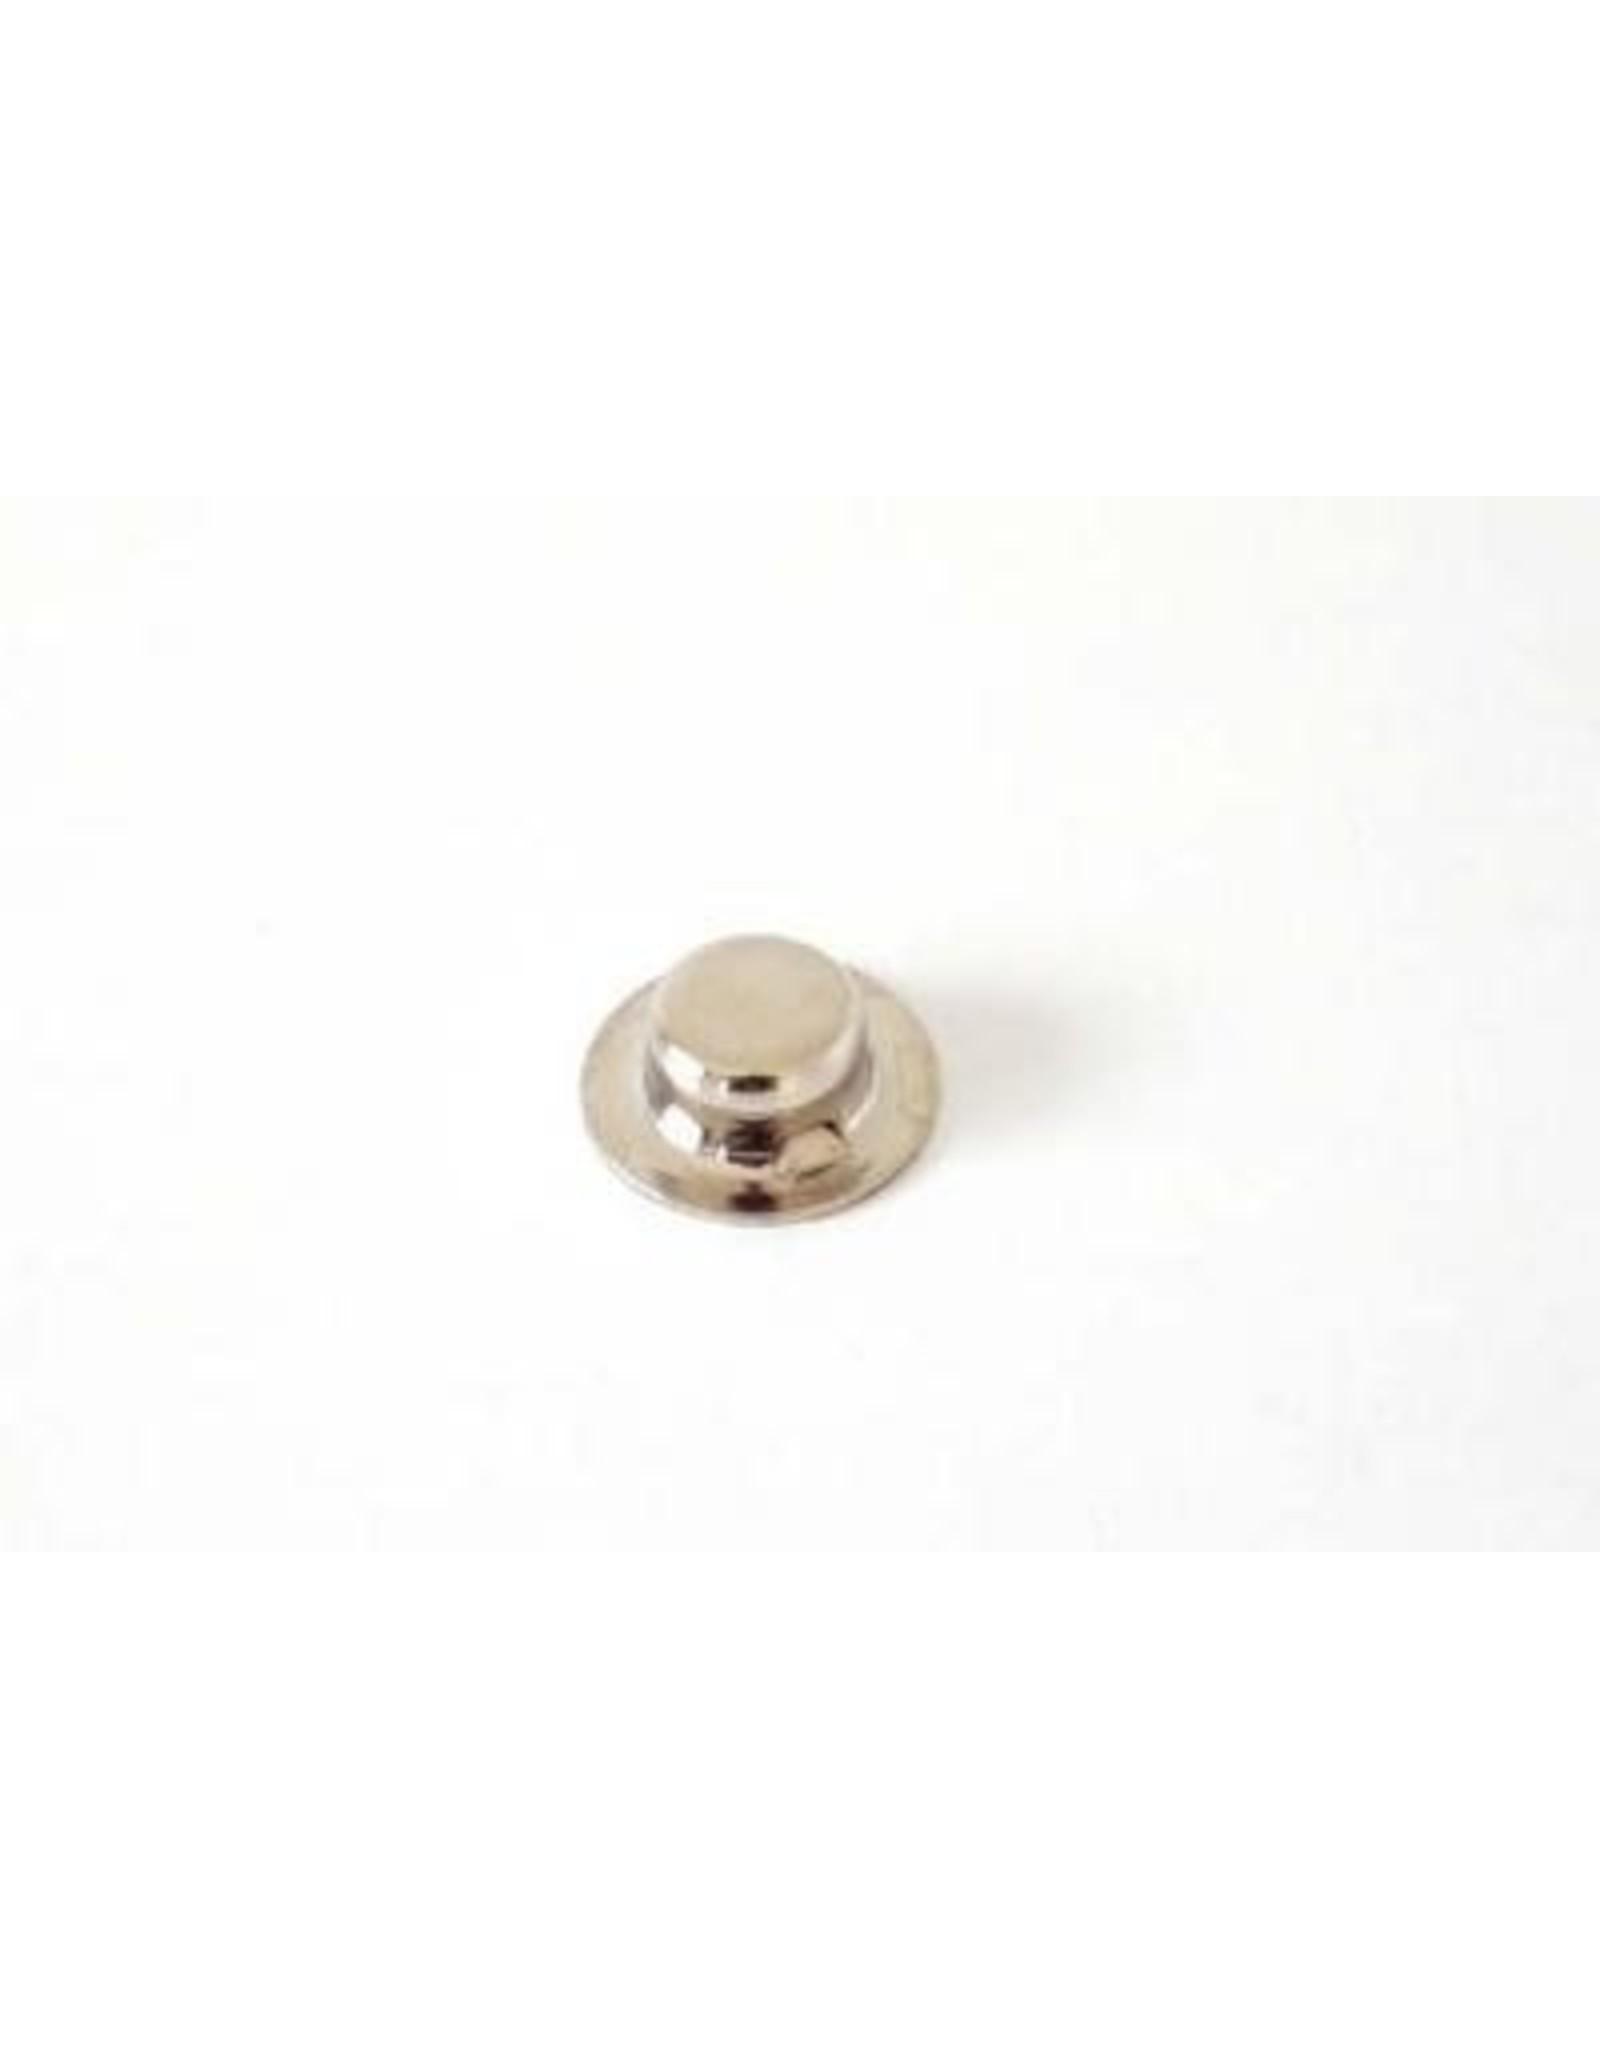 Rolly Toys As klem eindkap 12 mm